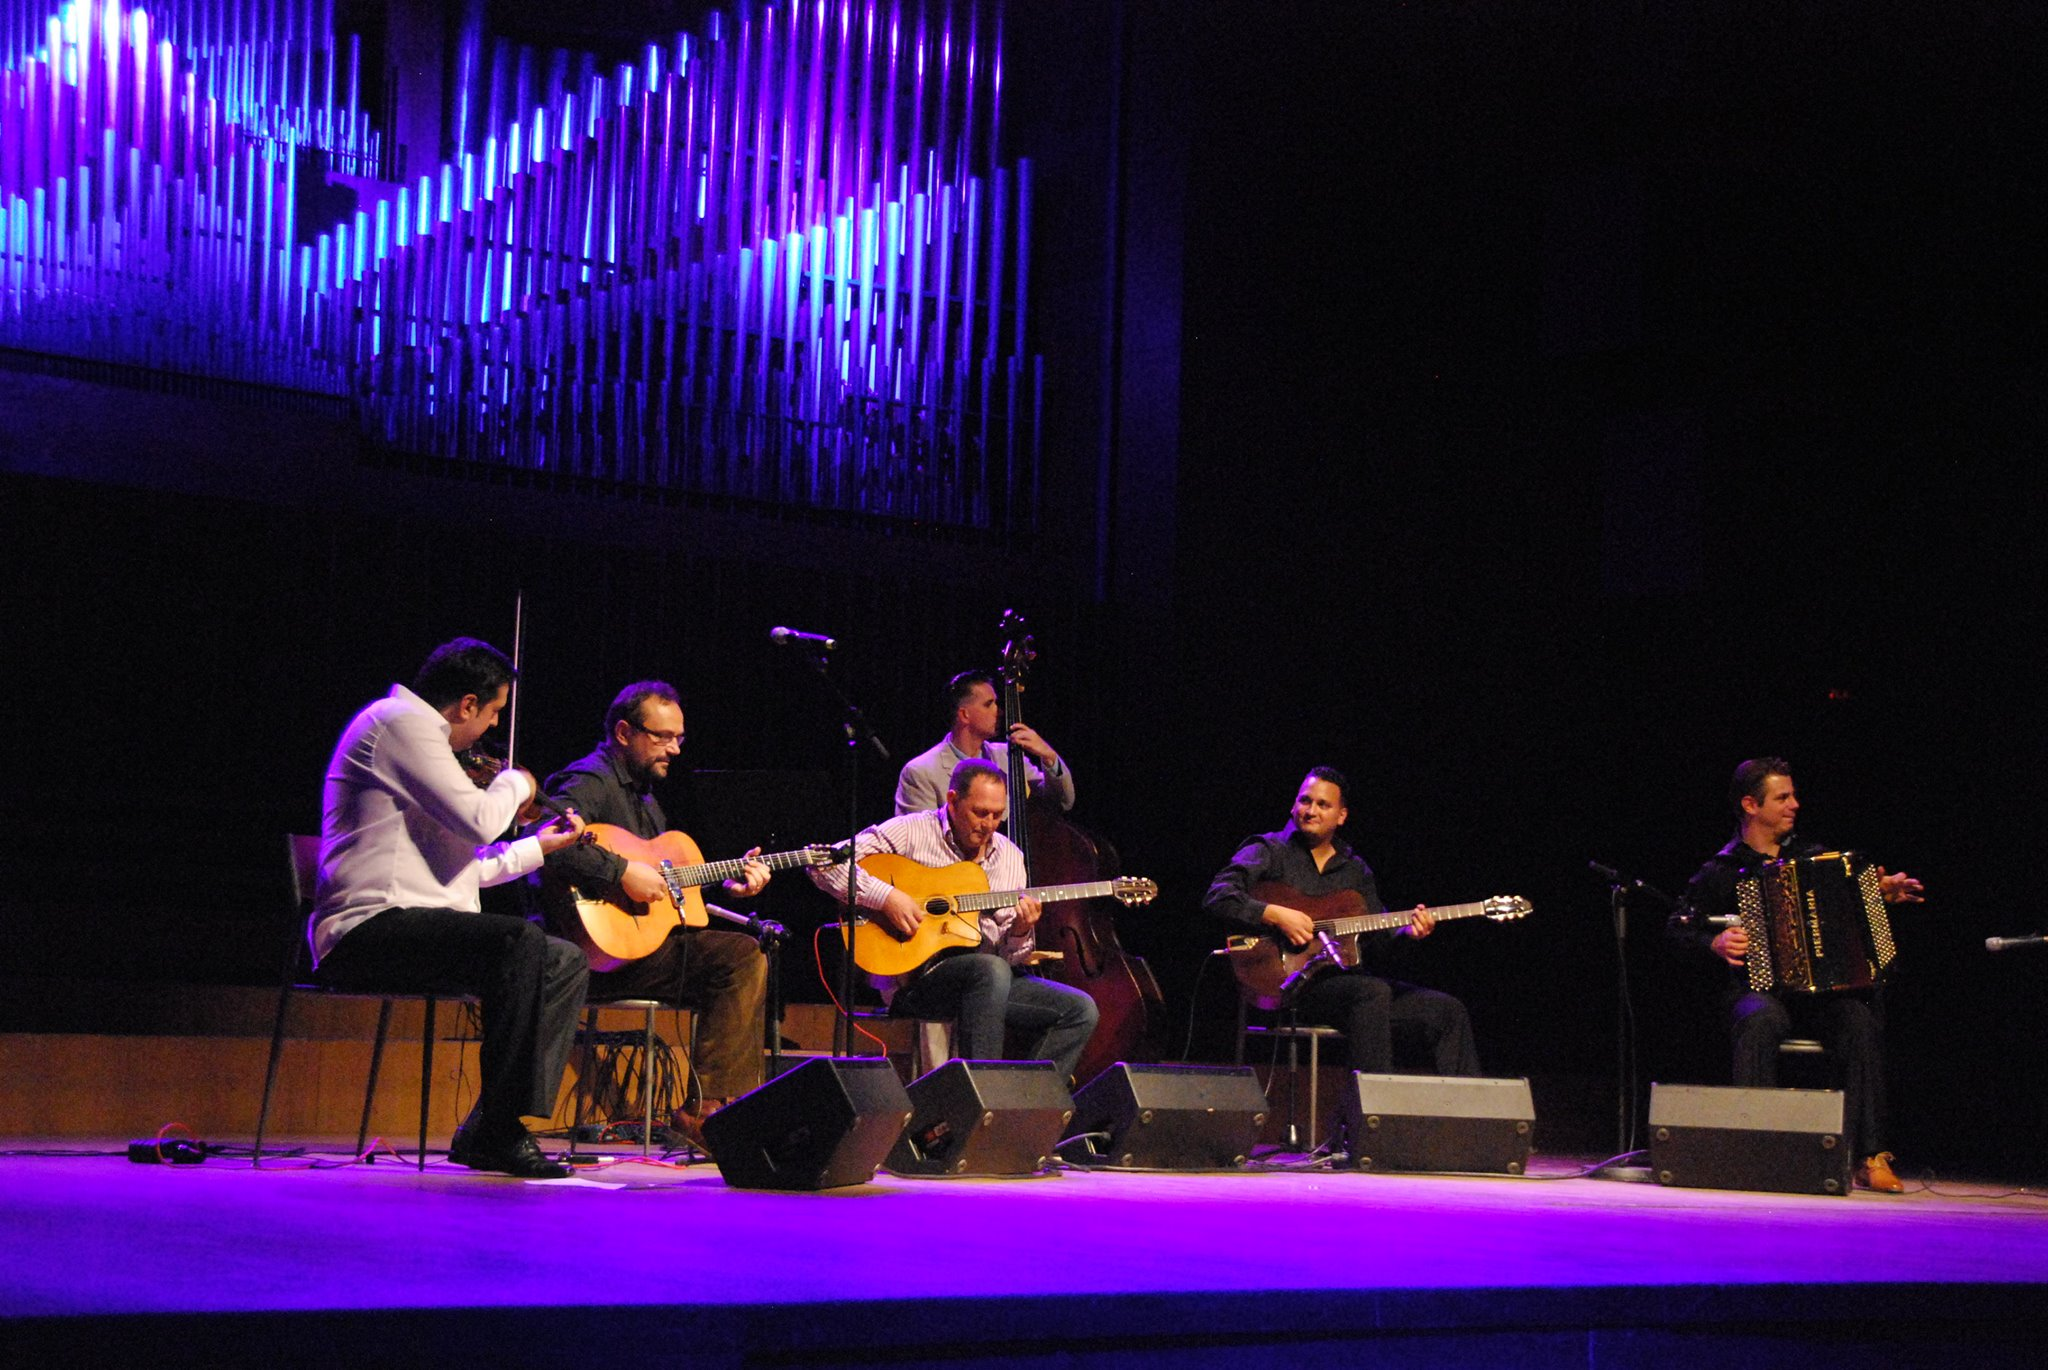 All-Stars-Gypsy-Band-presents-Django-Reinhardt-Legacy-Project_Vatroslav_Lisinski_1